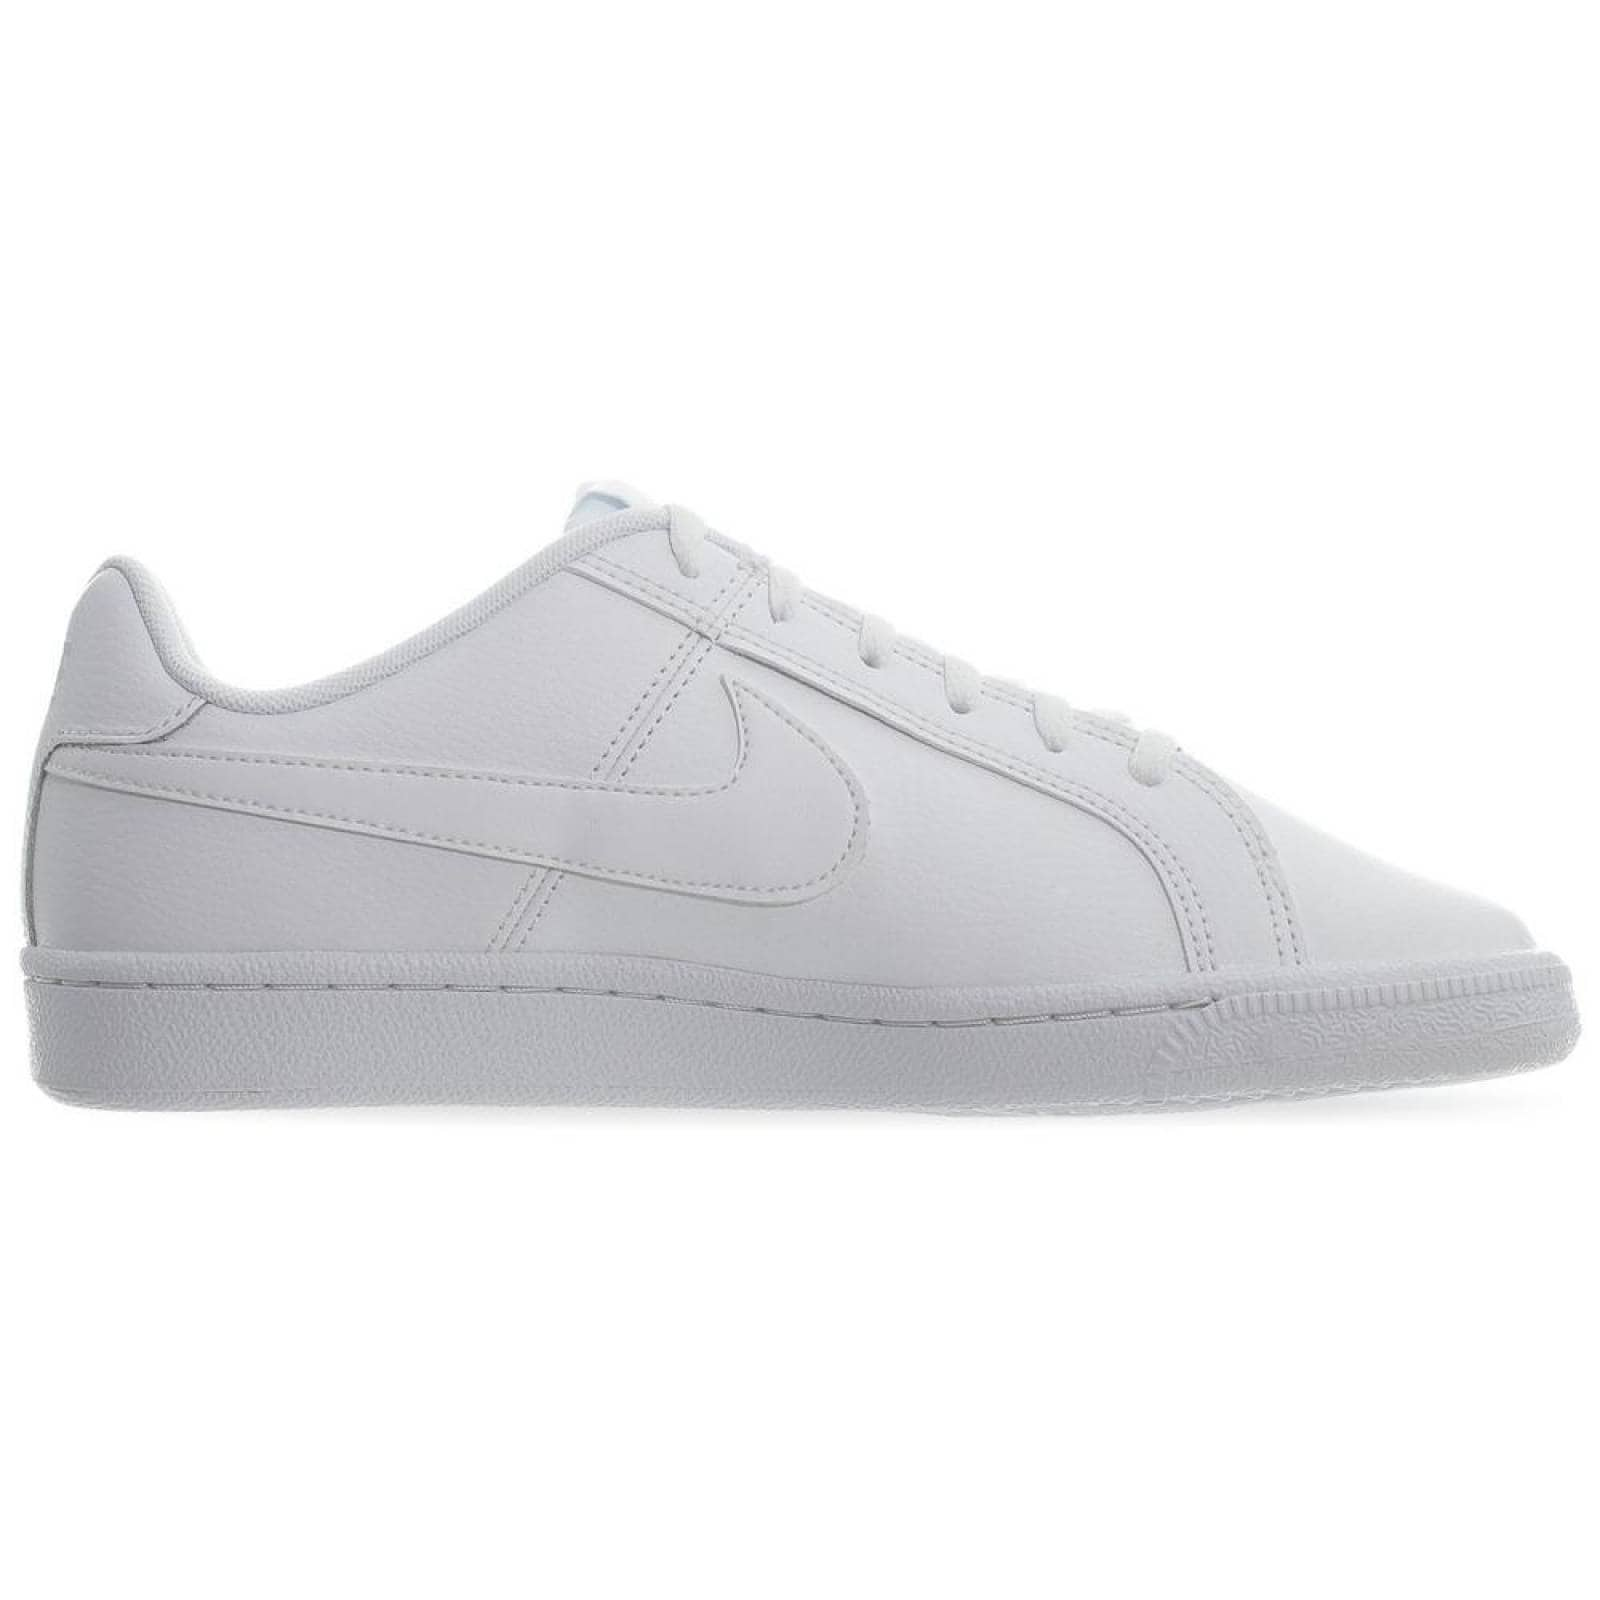 Tenis Nike Court Royale GS 833535102 Blanco Joven